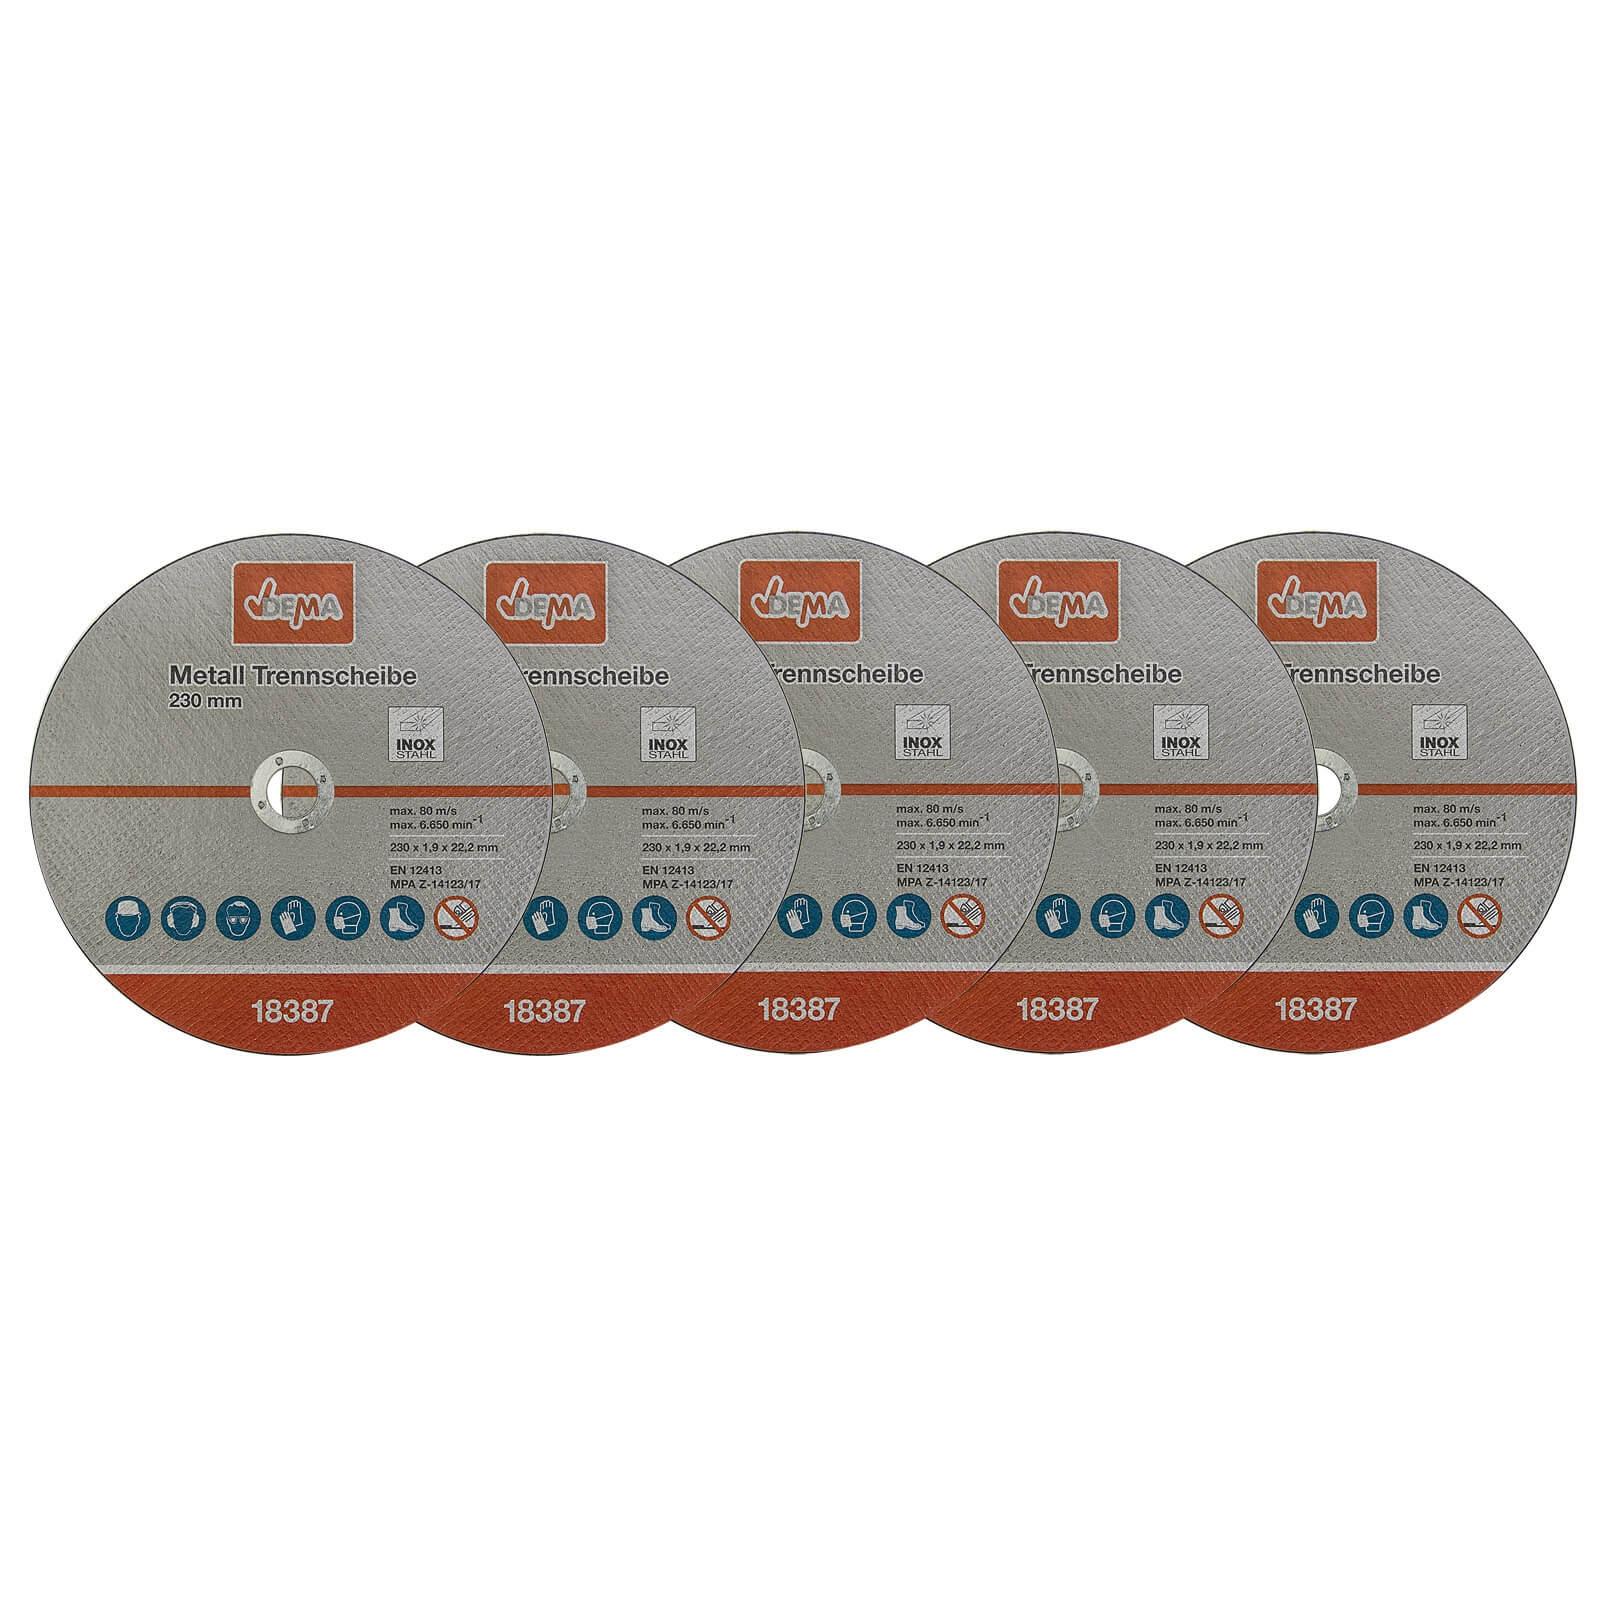 Dema Metall Trennscheibe 5-er Set 230mm Flexscheibe Winkelschleifer Trennschleifer 18387